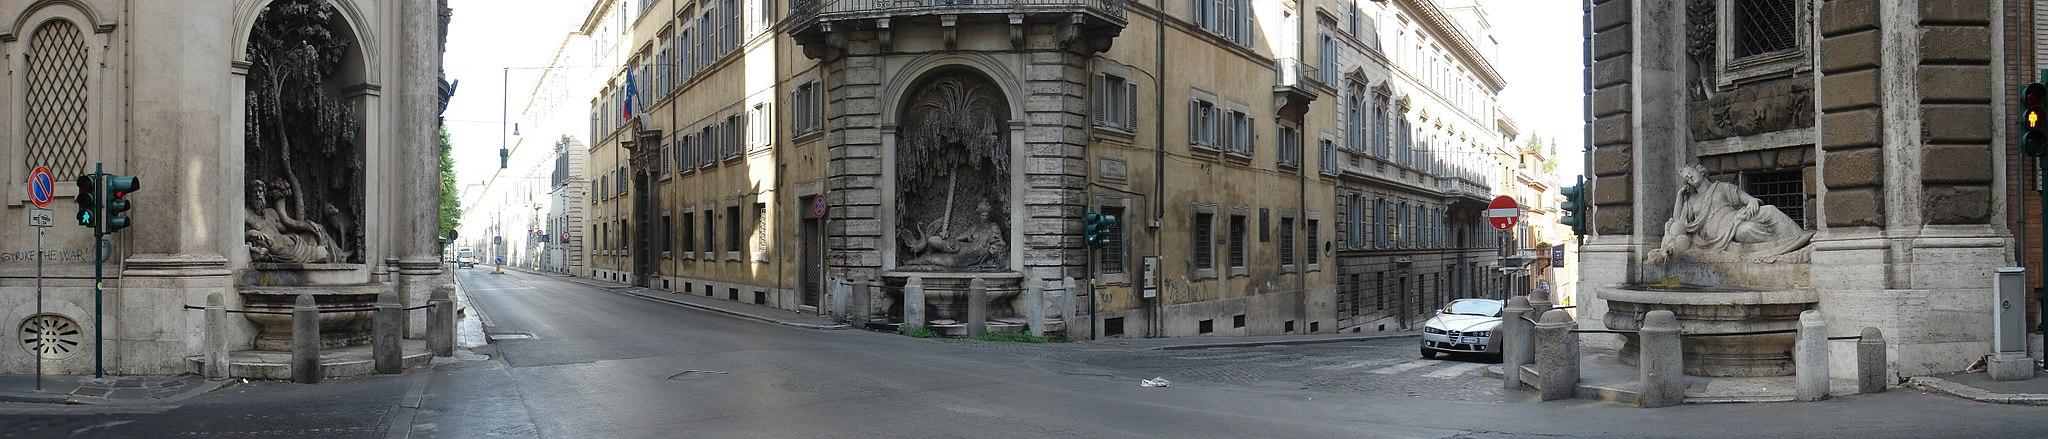 Piazza Quattro Fontane 270deg Pano